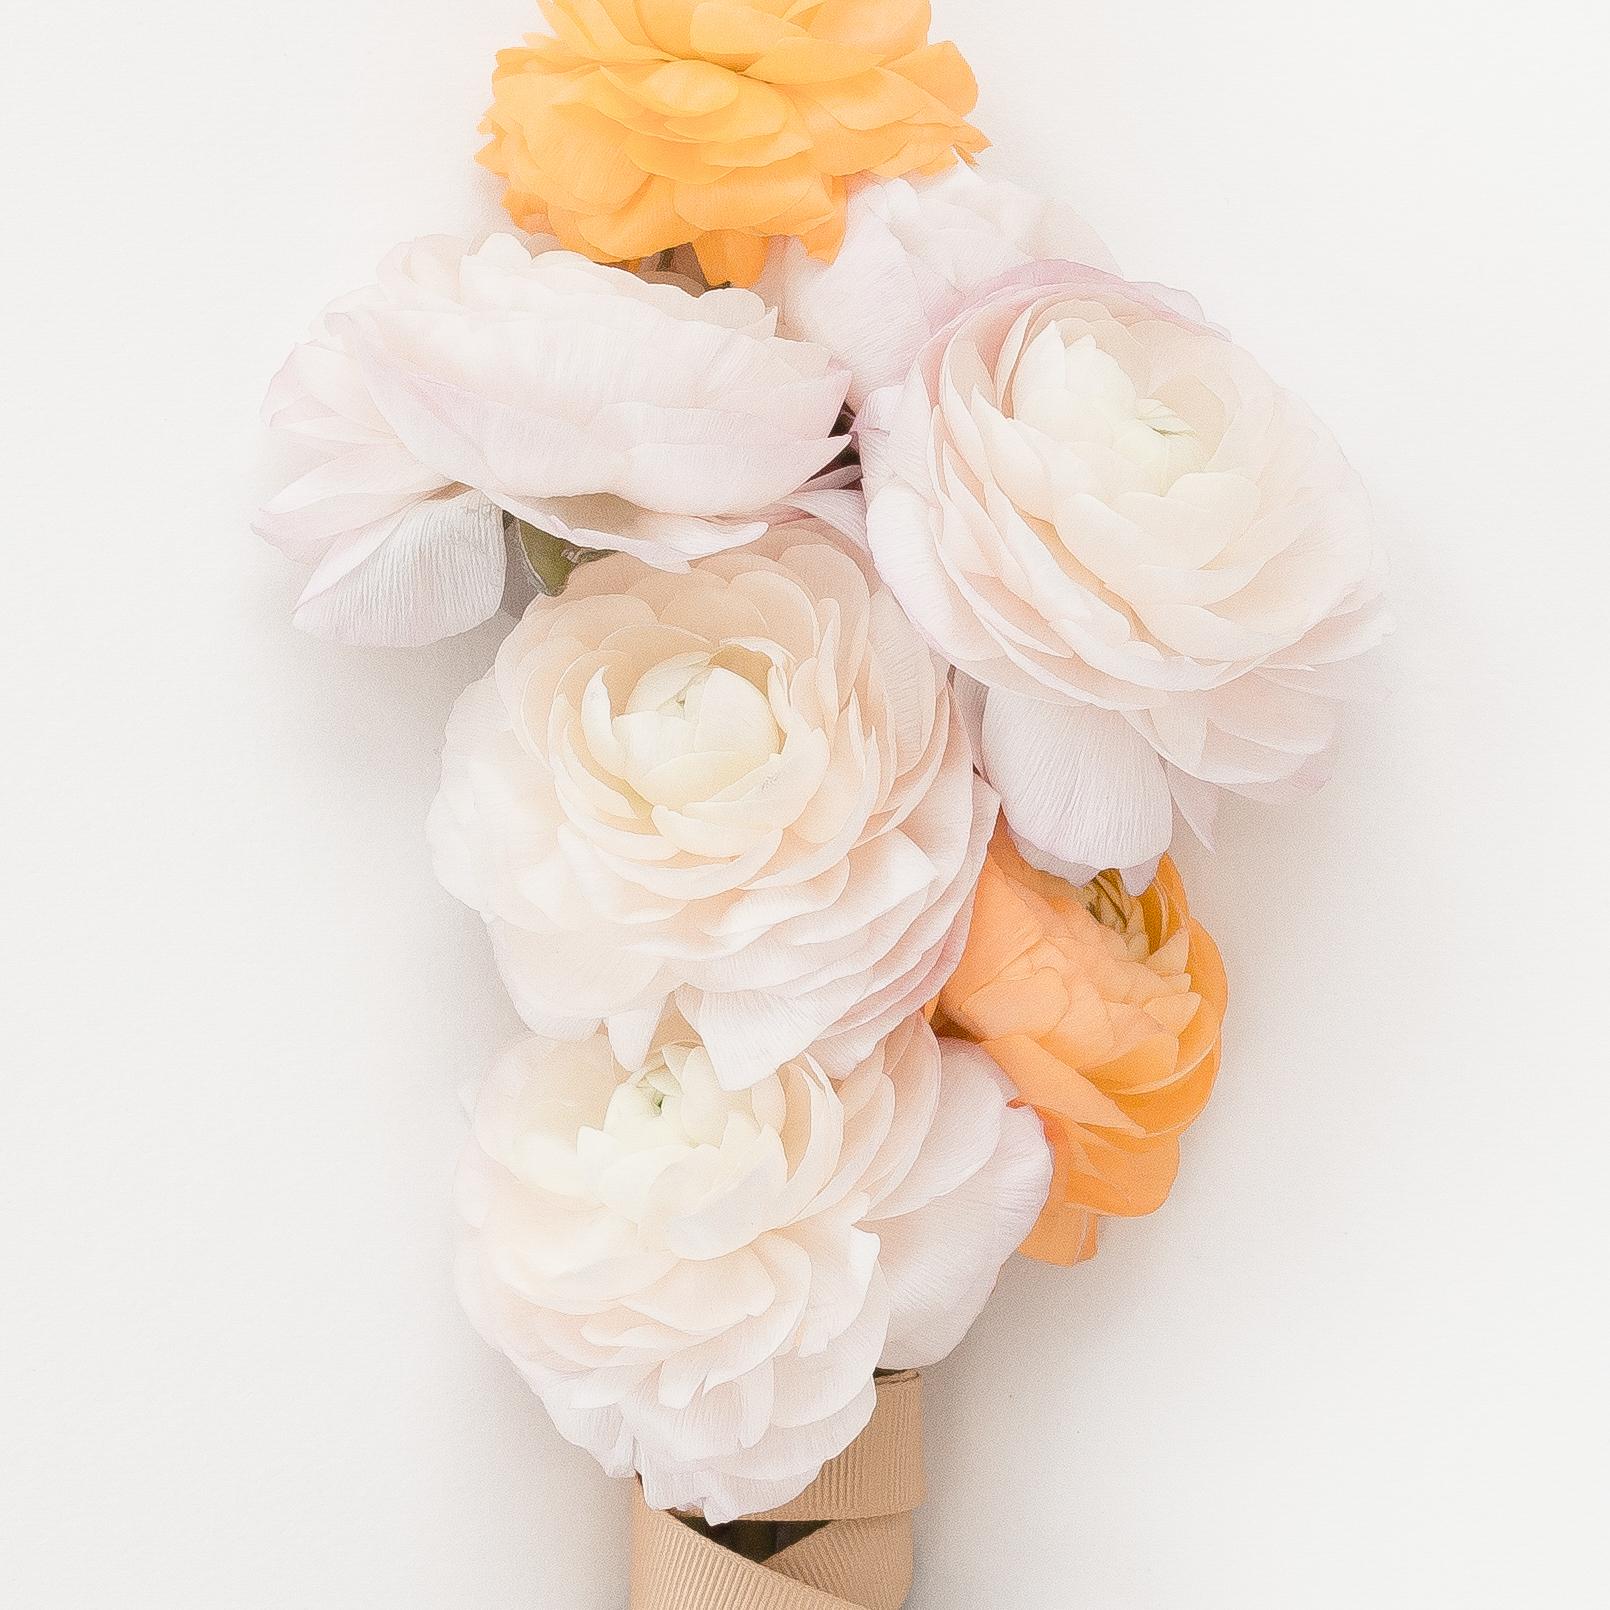 haute-stock-photography-peachy-25.jpg